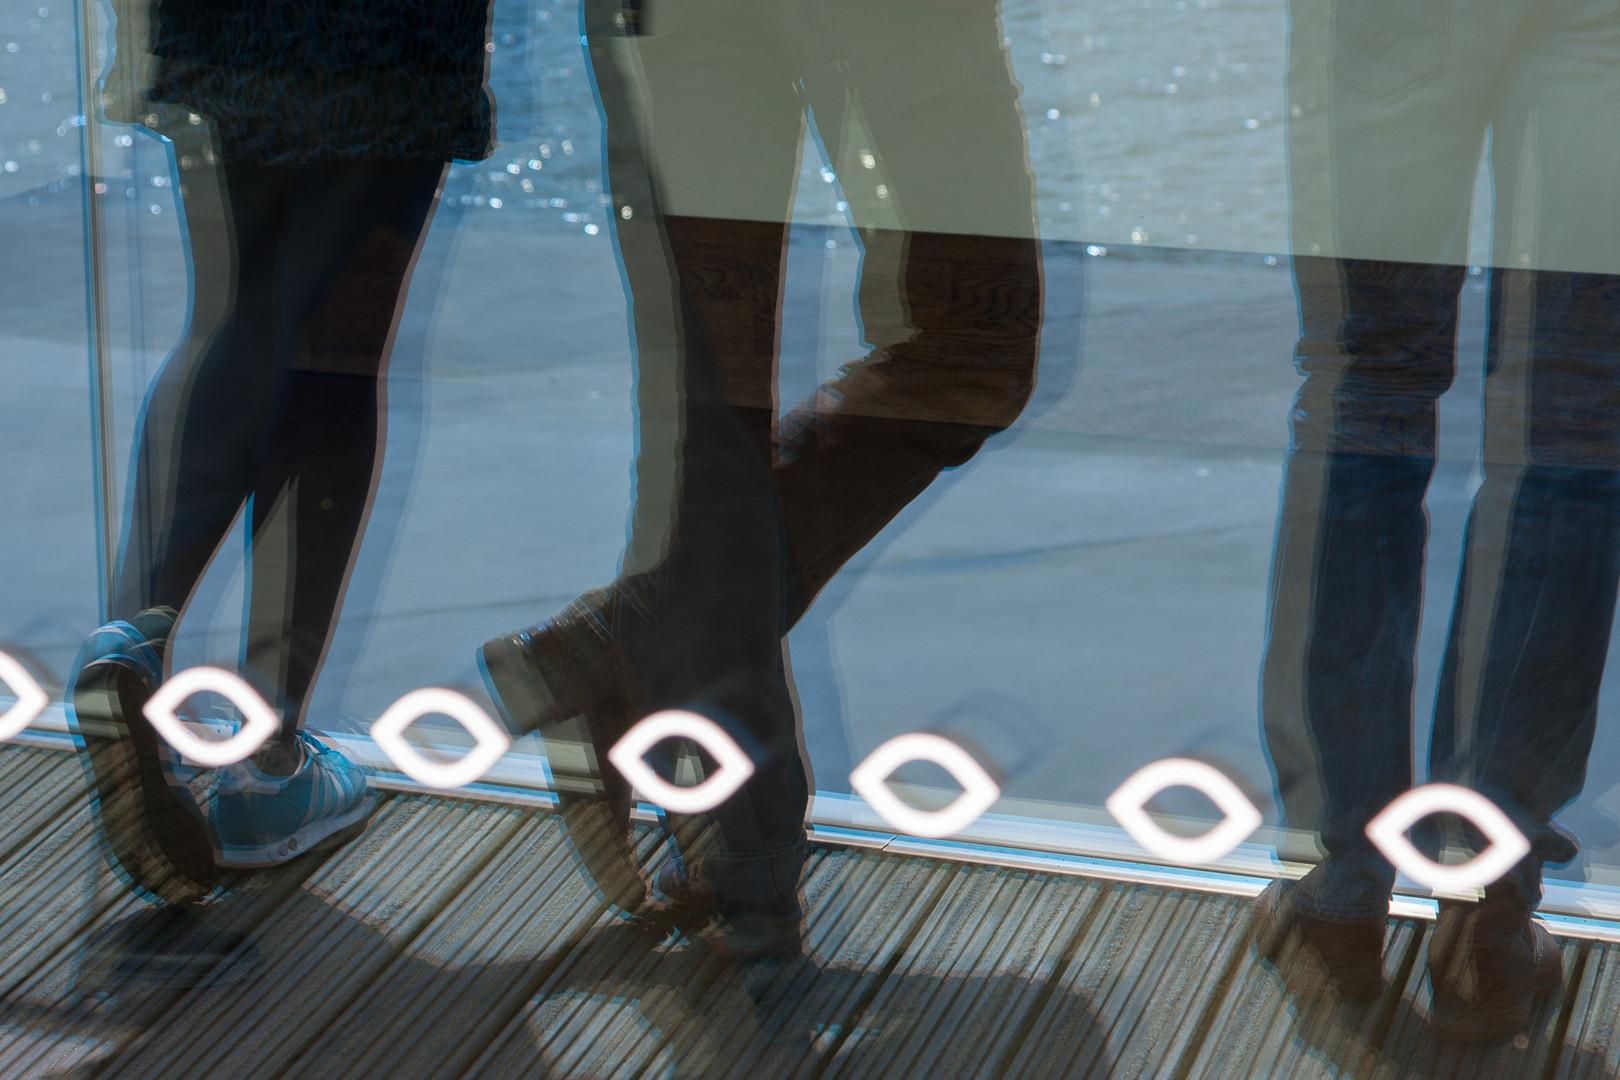 Cool Legs (am Filmmuseum eye)